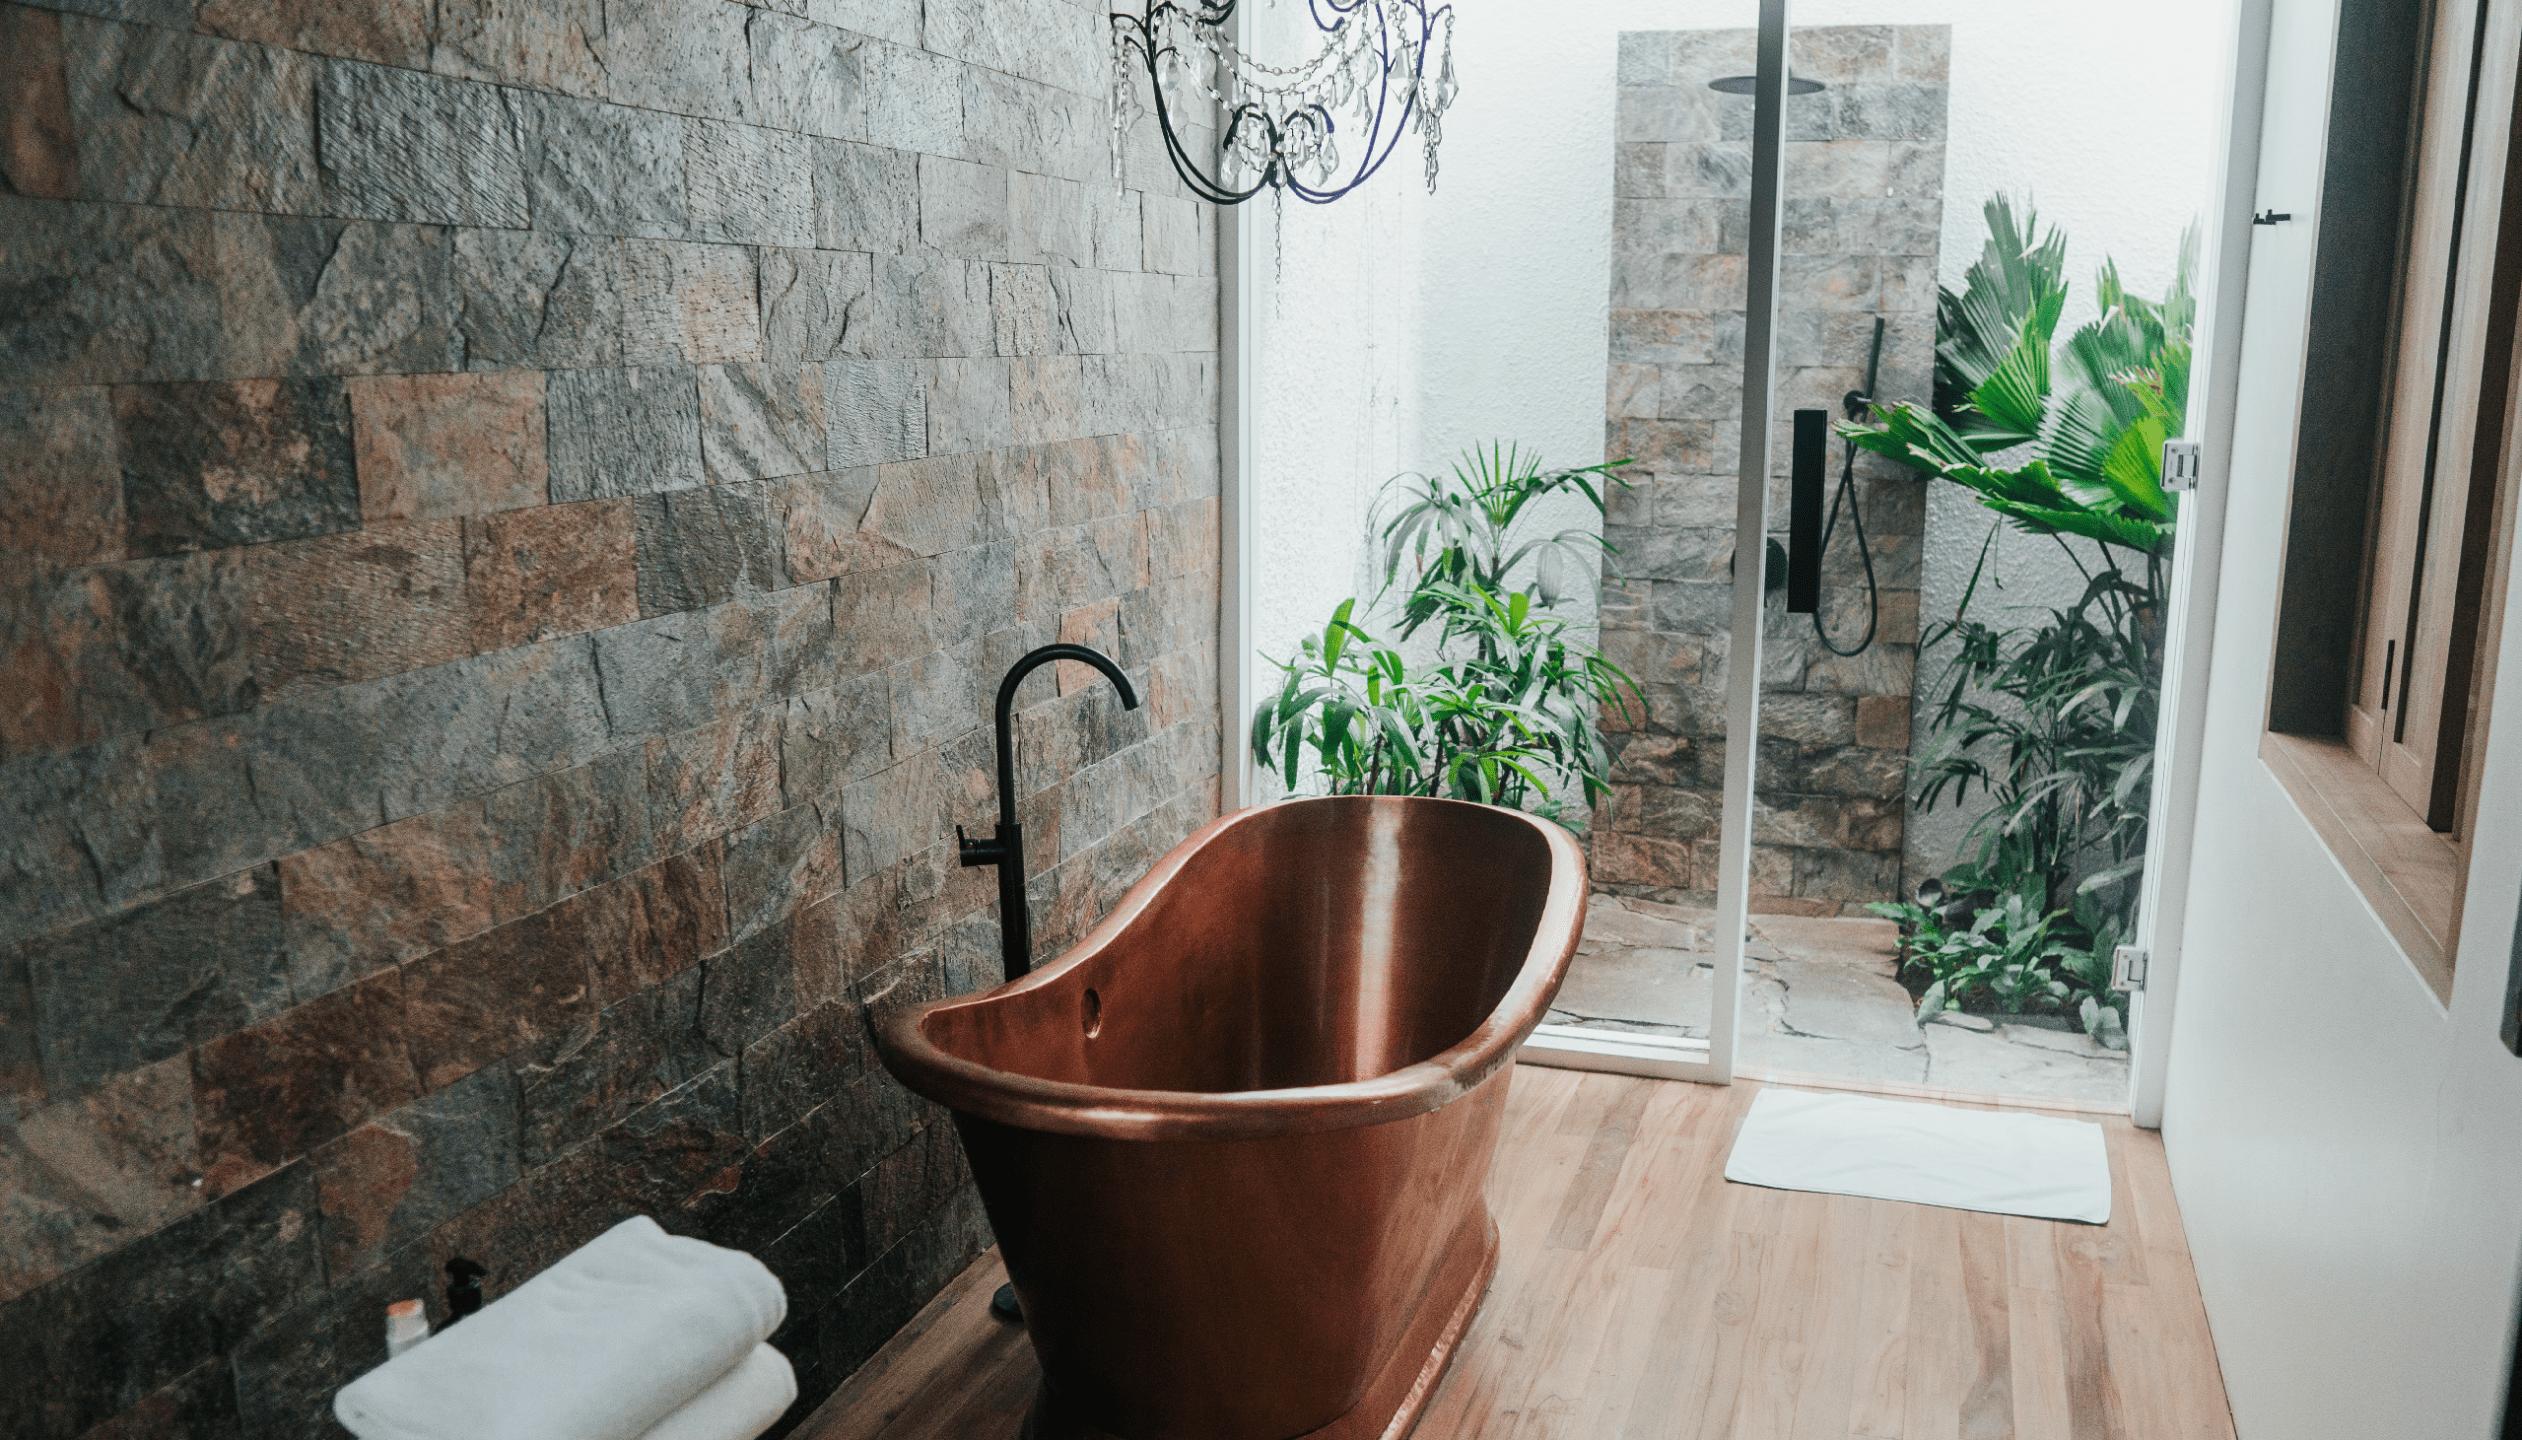 A copper freestanding bath tub in front of the patio door